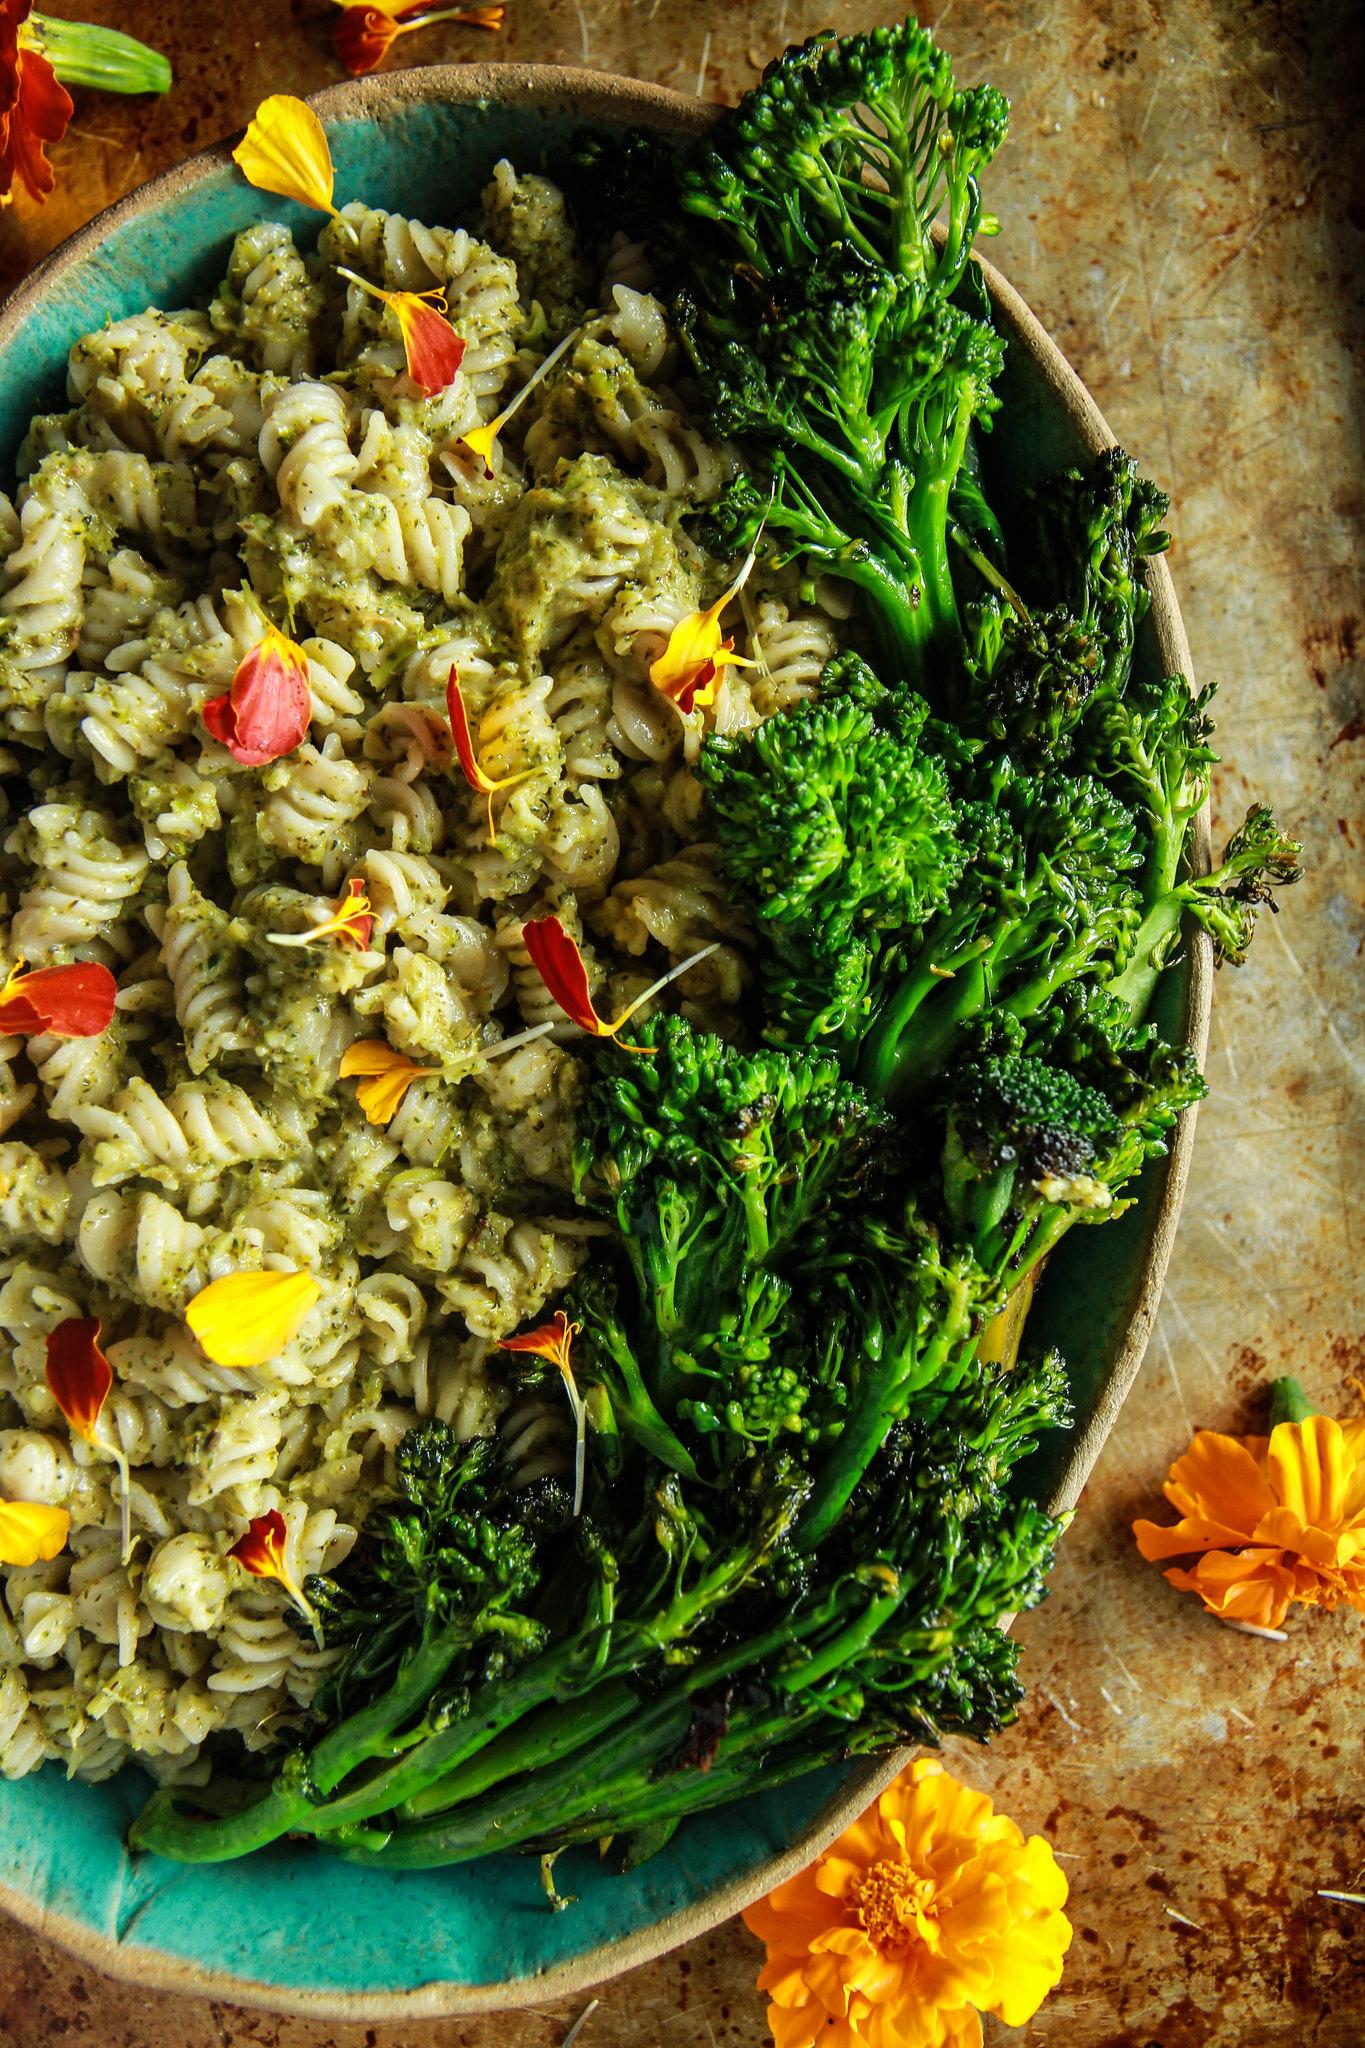 Roasted Broccoli Pesto Pasta - Gluten-free and Vegan from HeatherChristo.com